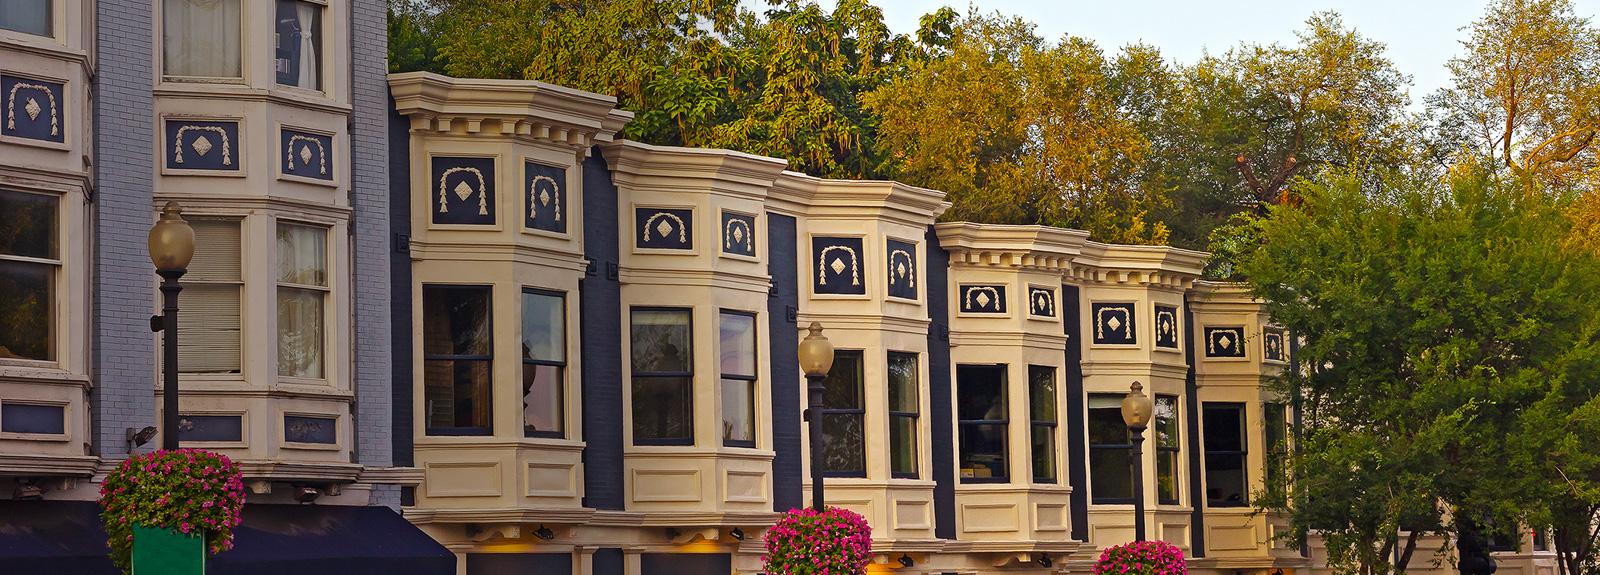 Washington D.C. home warranty companies